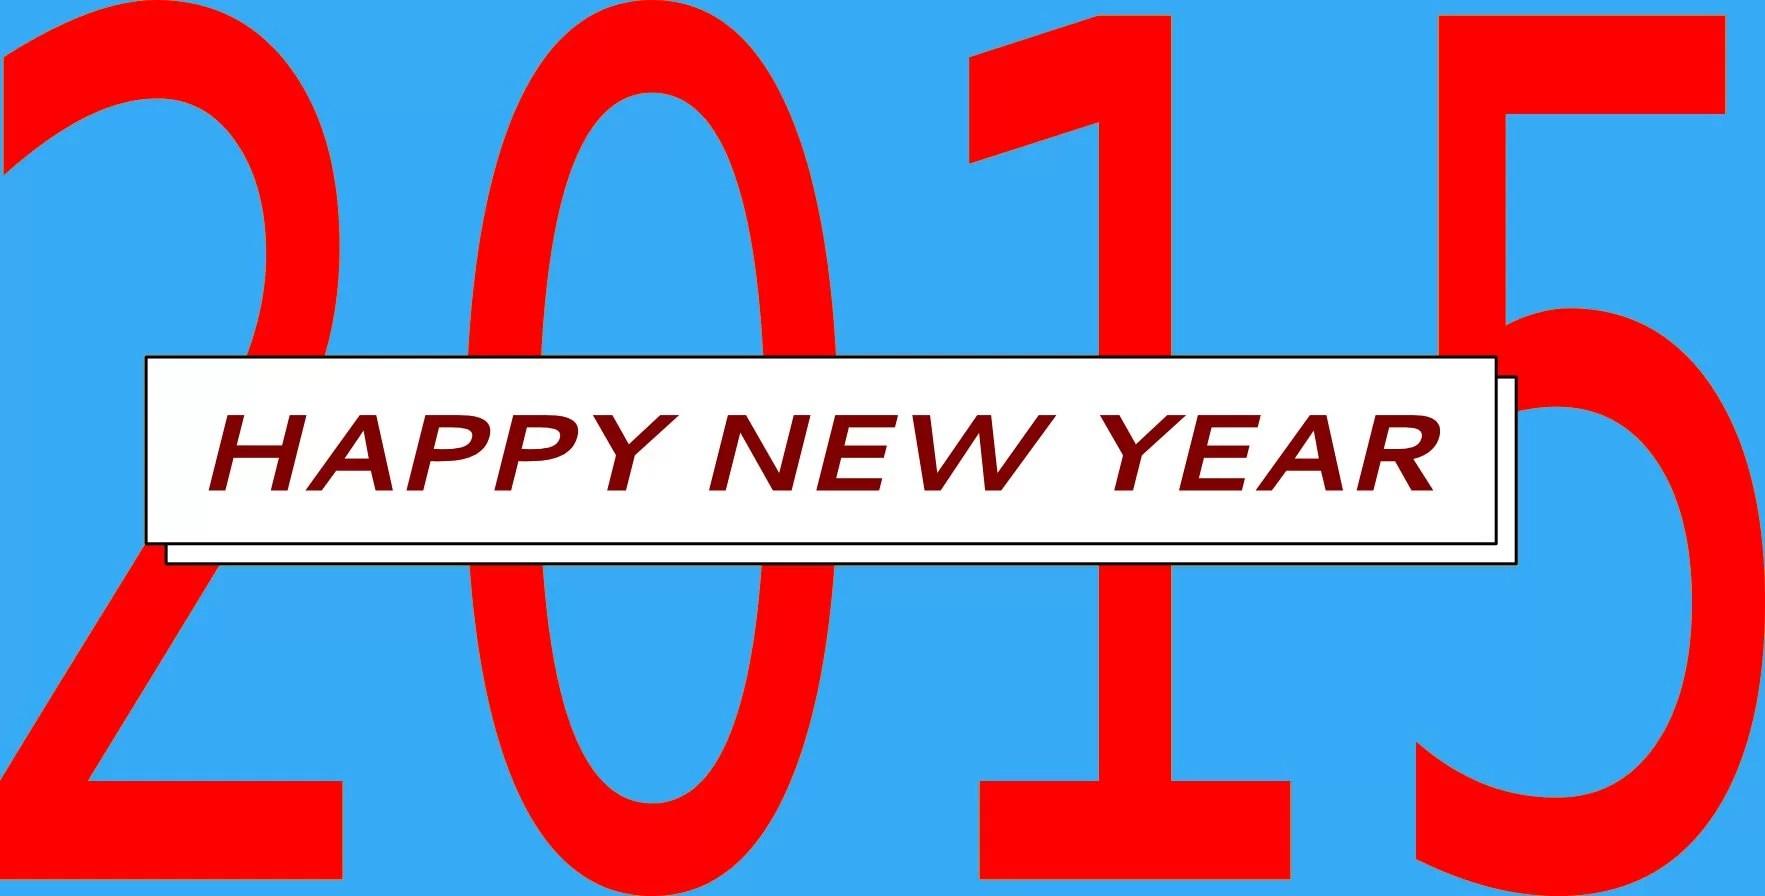 HAPPY NEW YEAR 2015 1